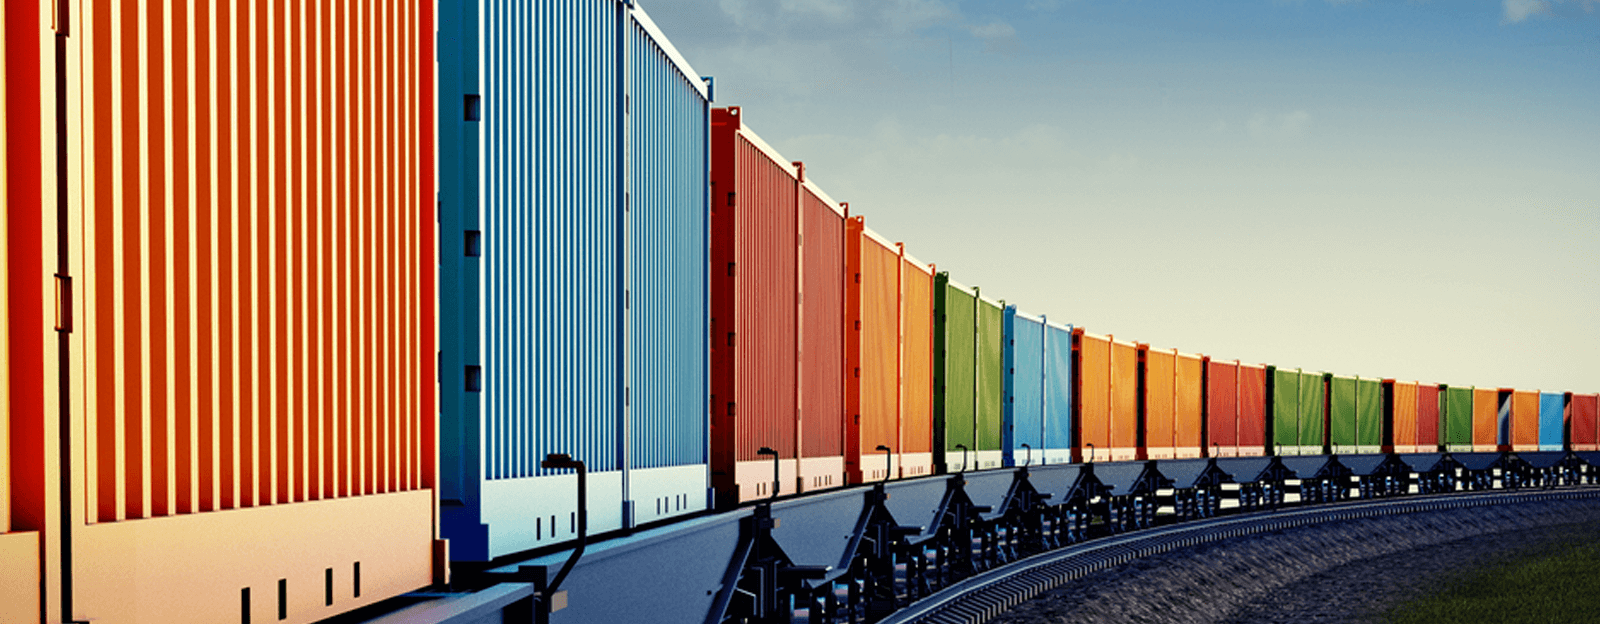 Rail & Rail Infrastructure